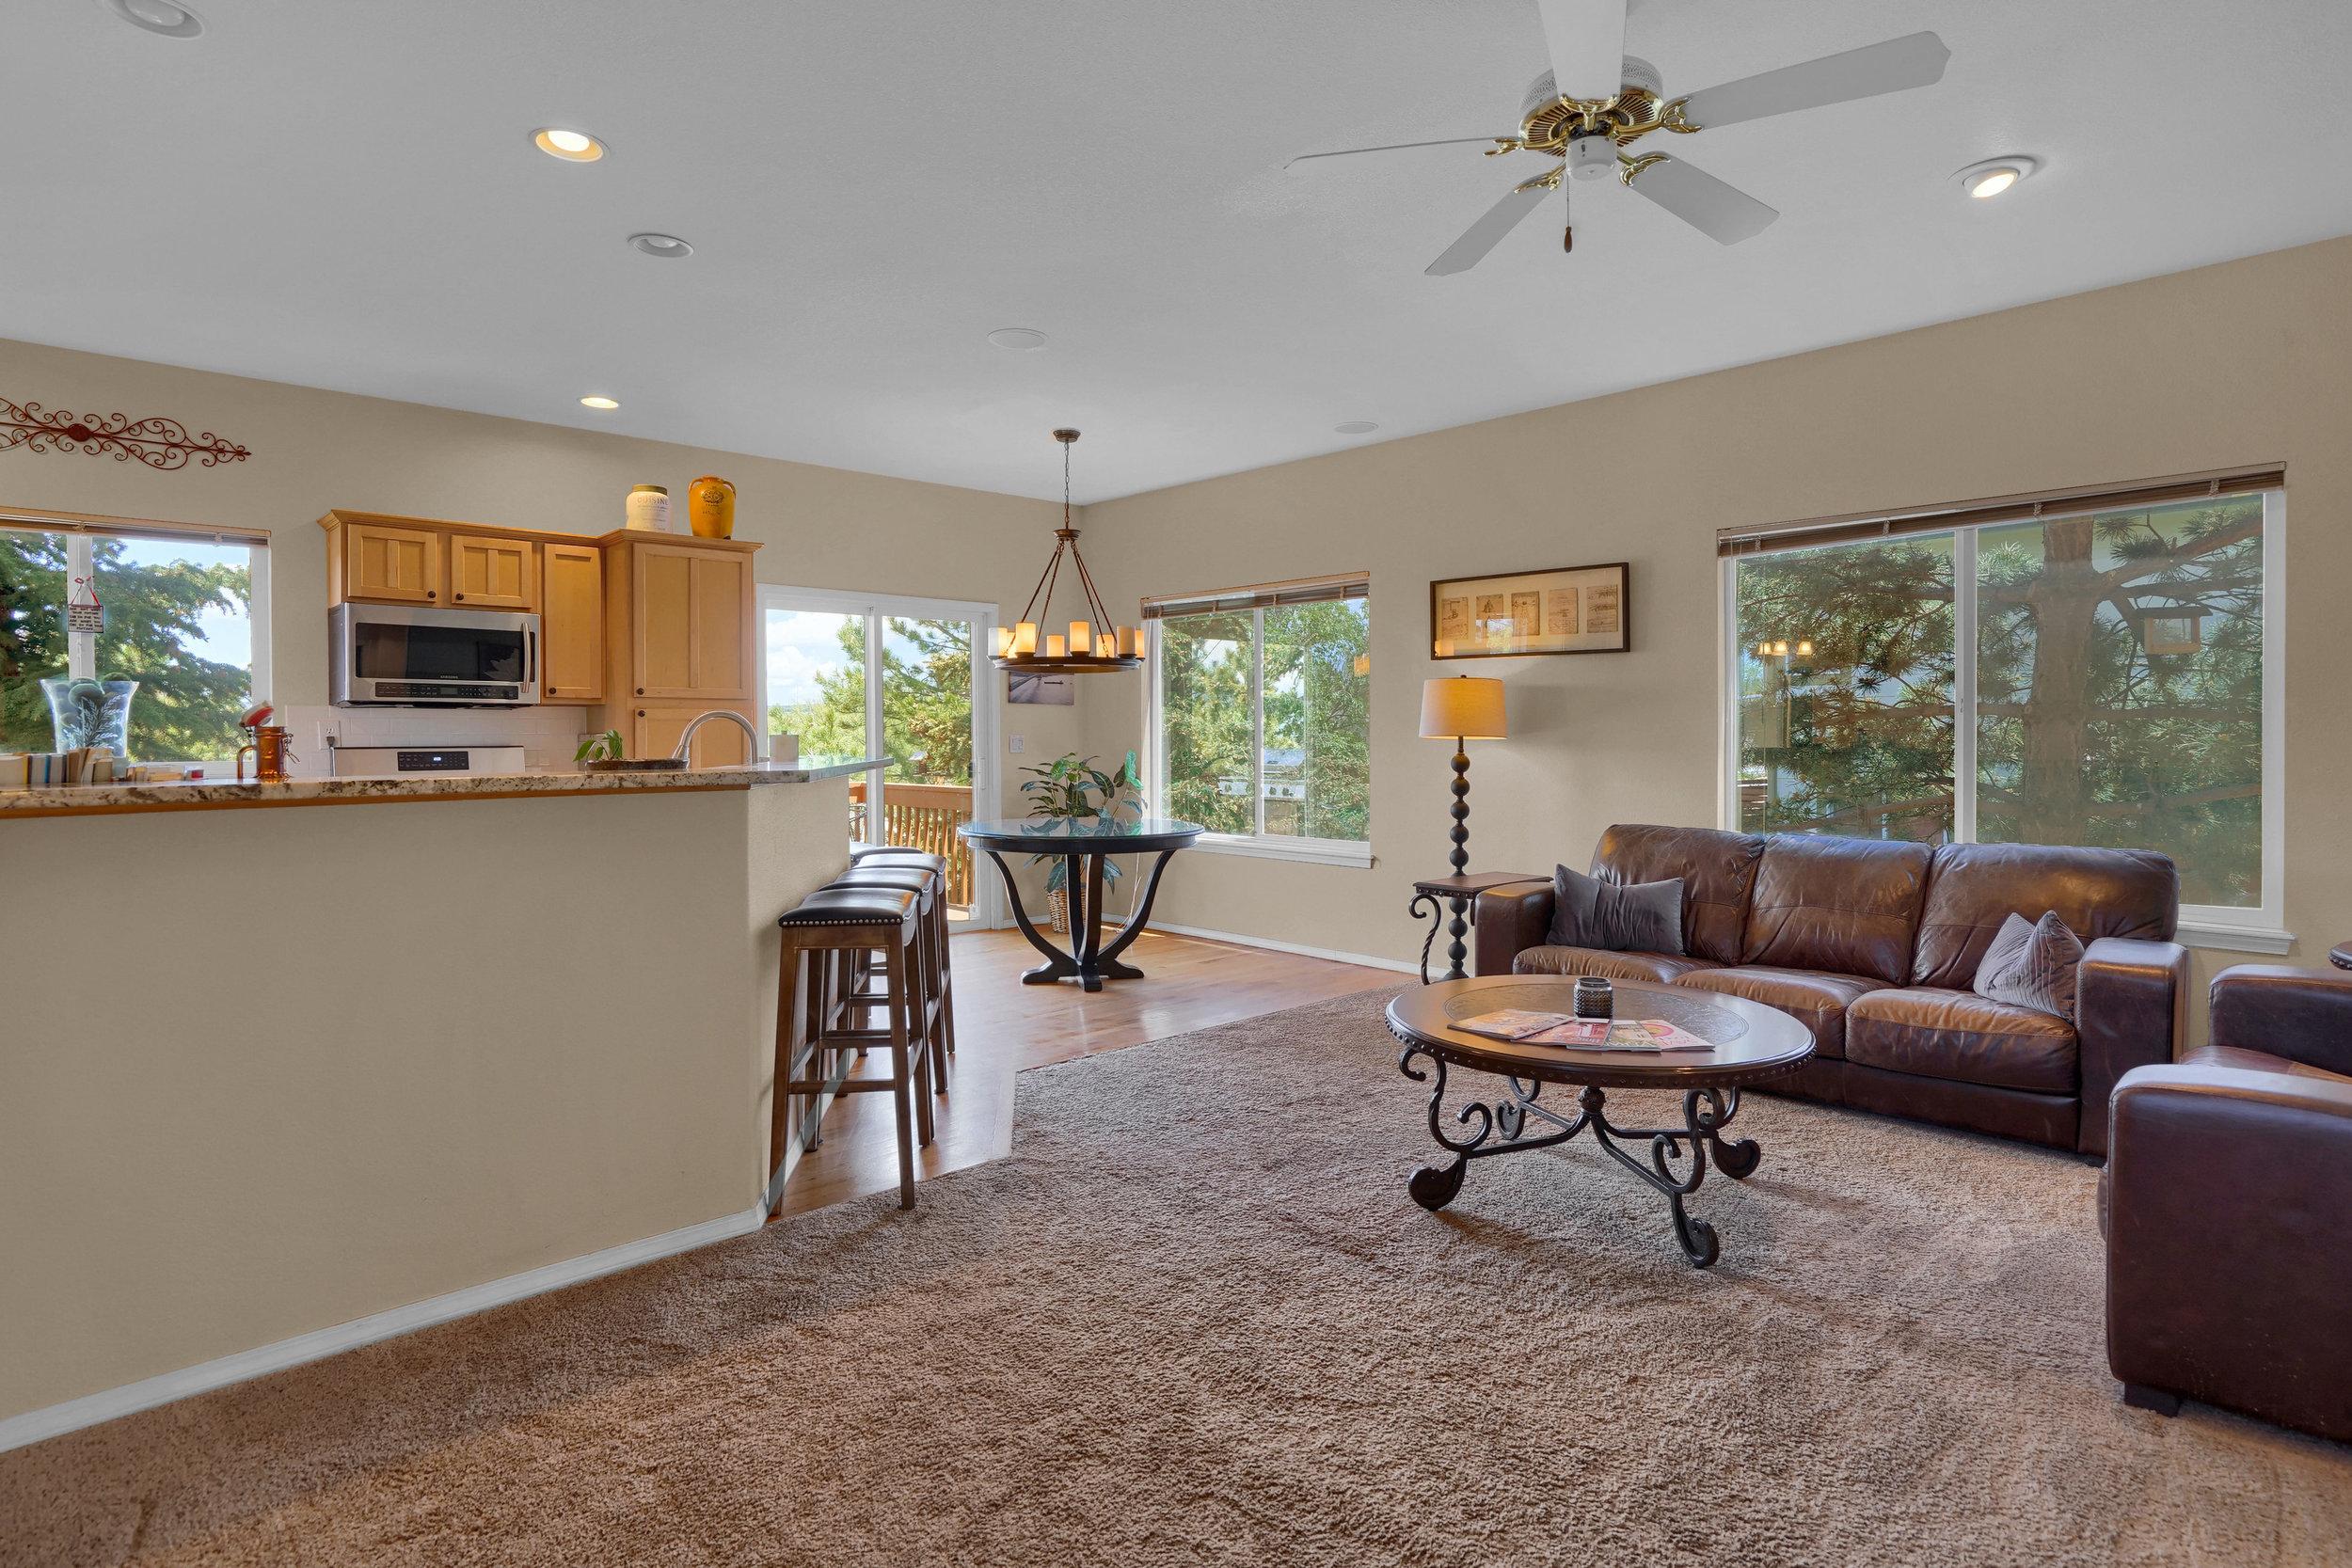 2756 Kittyhawk Road Colorado-print-015-031-Family Room-3934x2623-300dpi.jpg